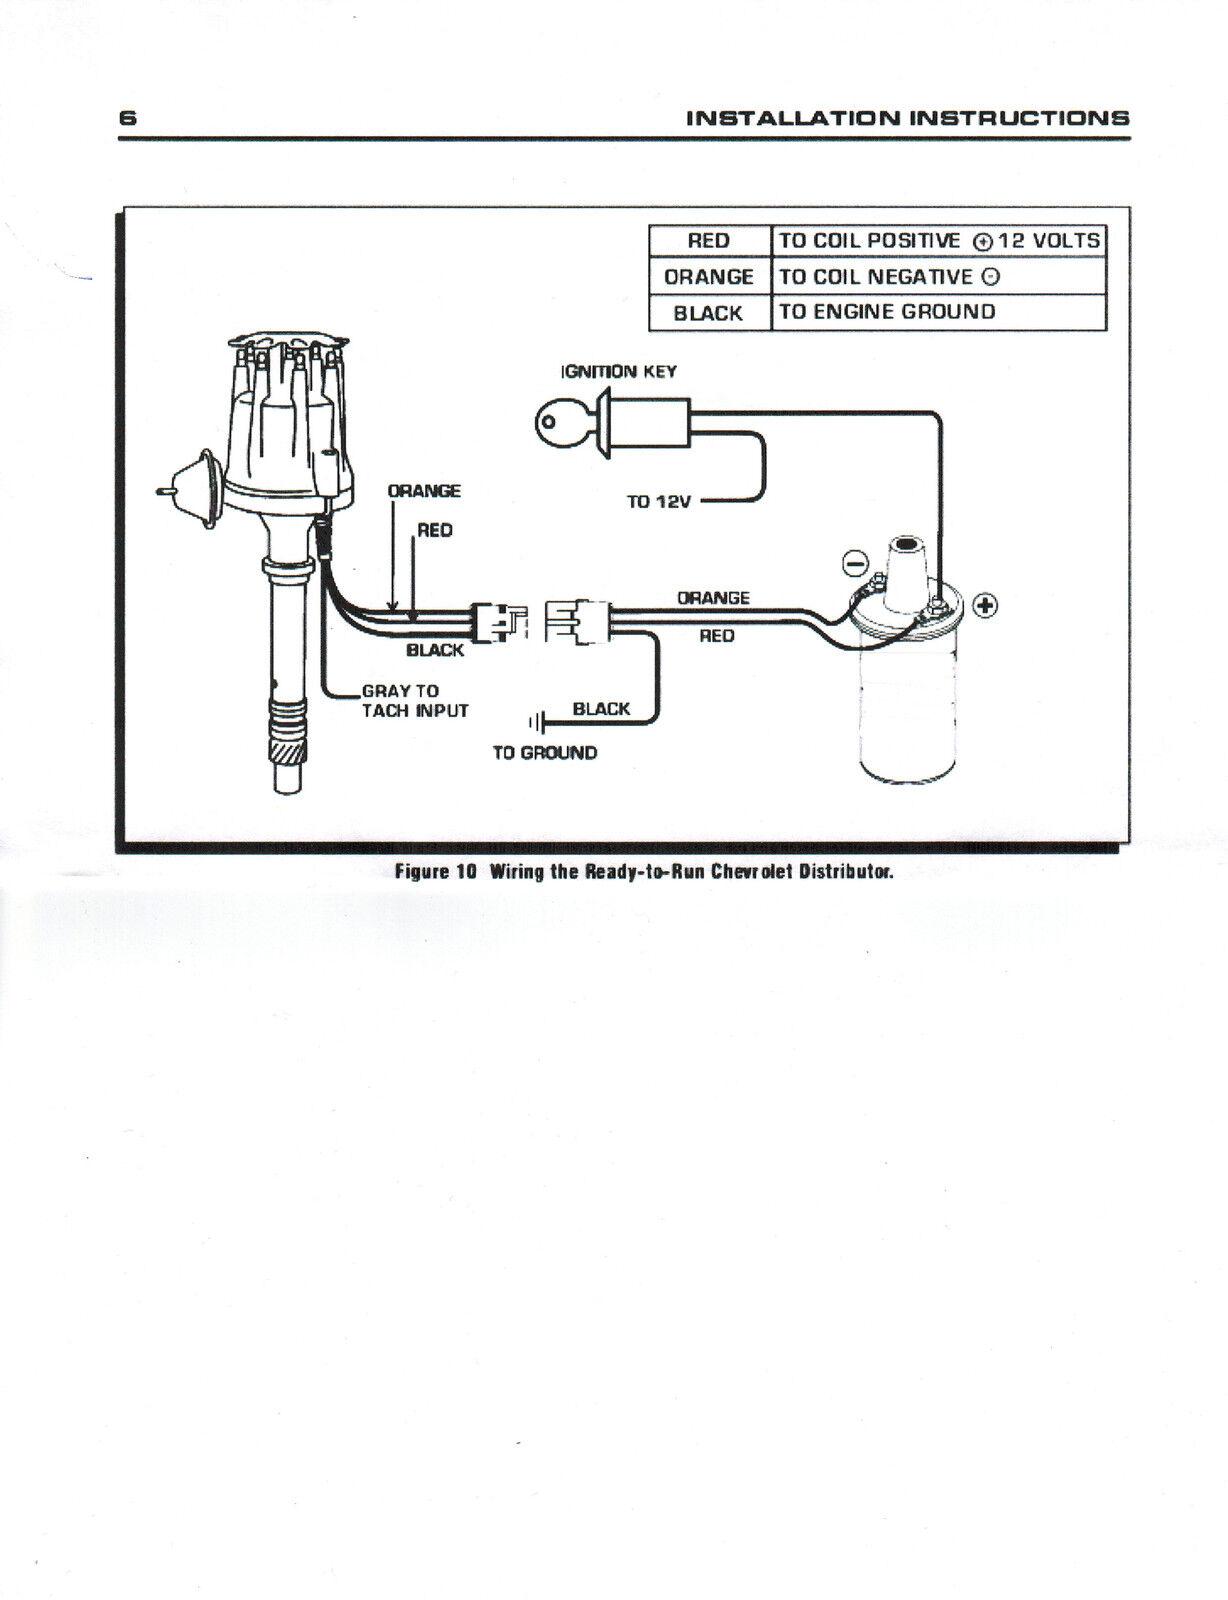 wiring diagram for hei distributor  u2013 ireleast  u2013 readingrat net  rh   readingrat net